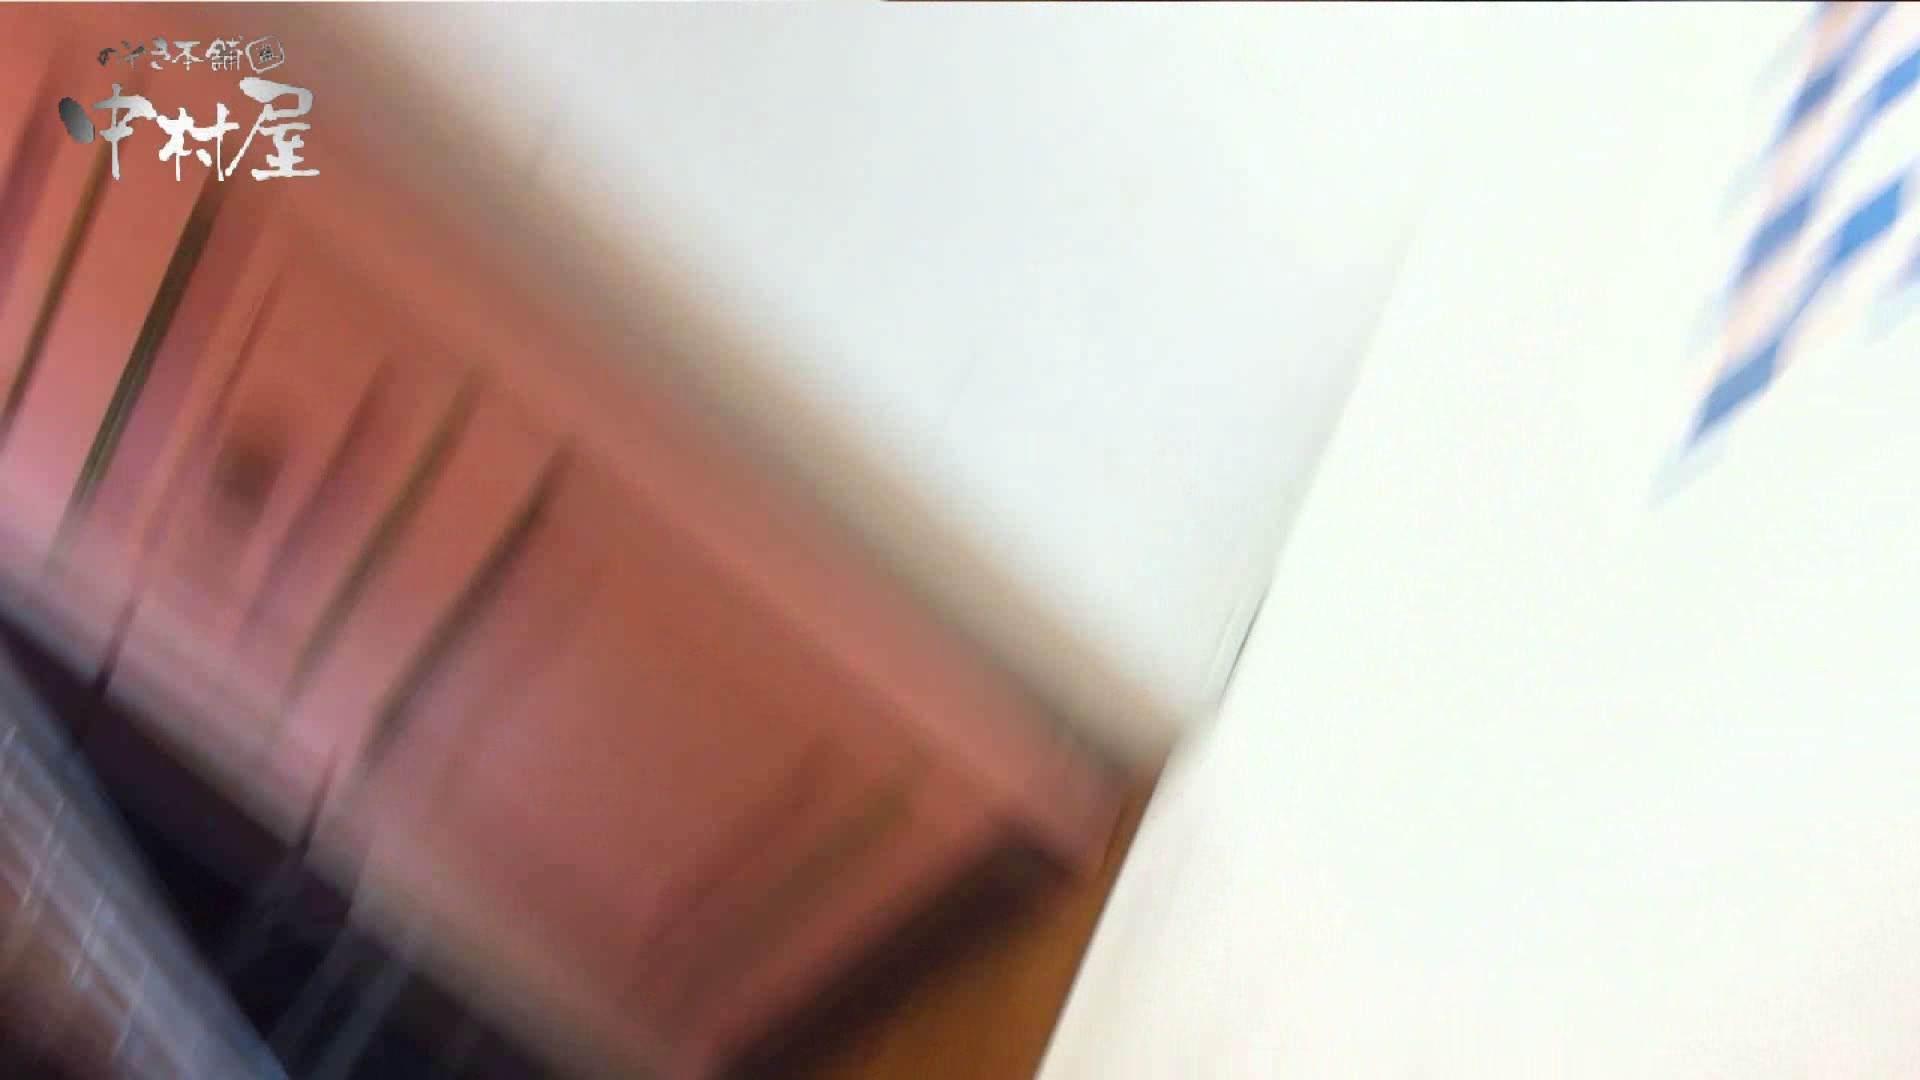 vol.43 可愛いカリスマ店員限定‼胸チラ&パンチラ 美脚おねーさんの胸元ゲット! パンチラ | HなOL  83pic 46